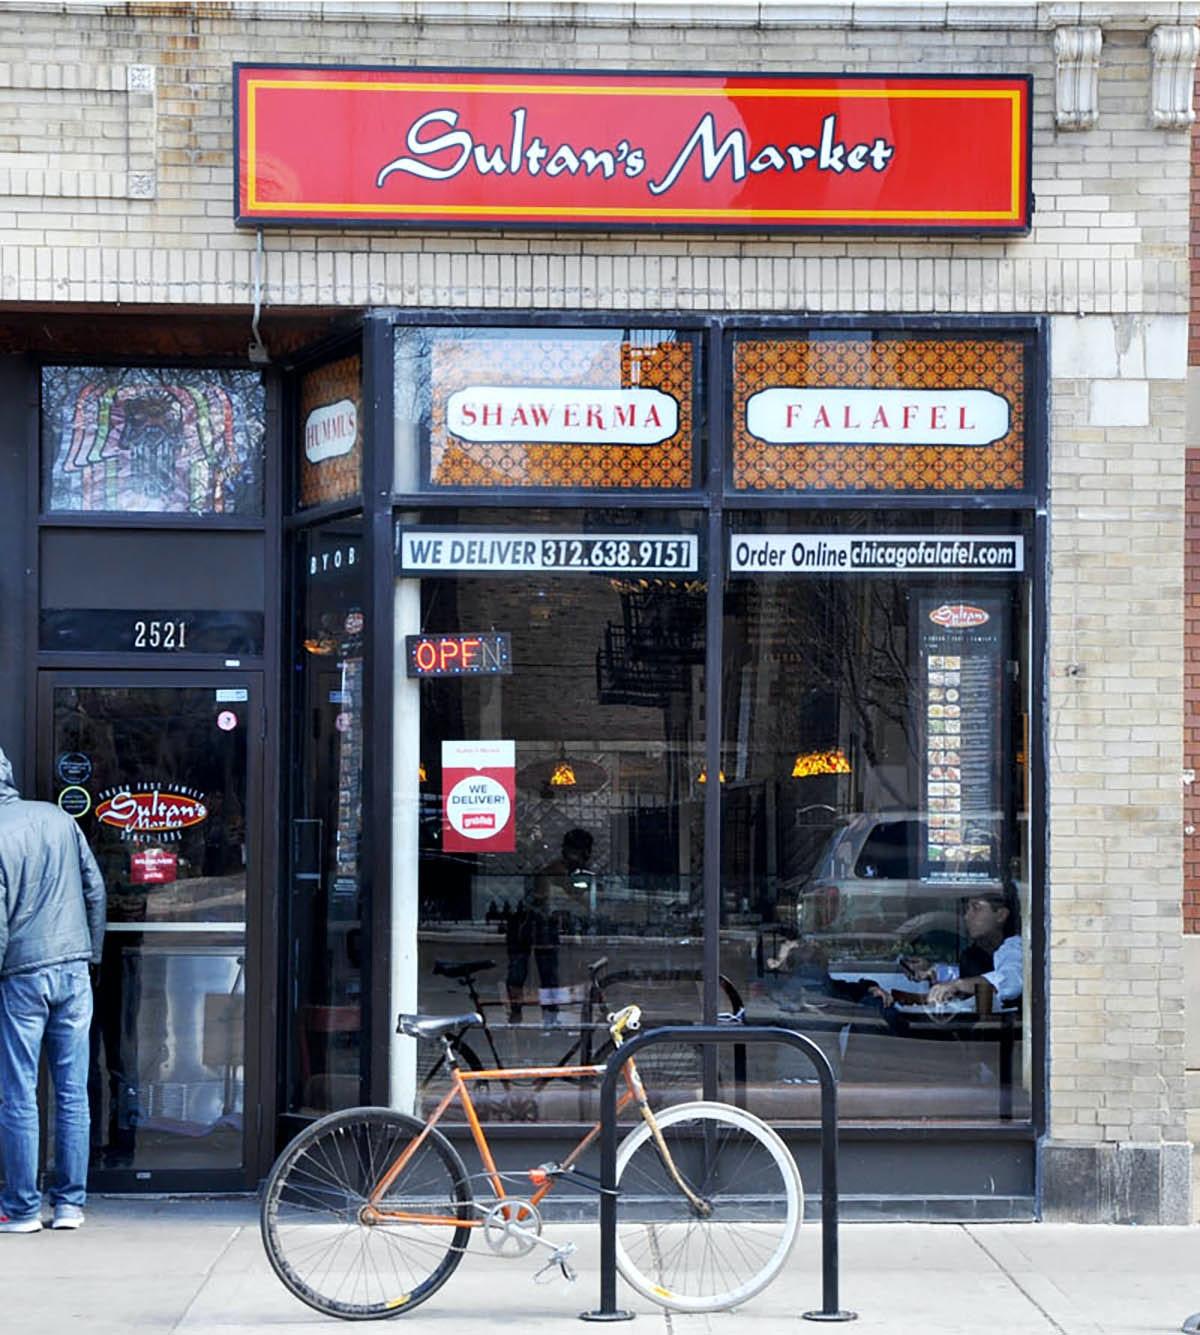 Sultan's Market